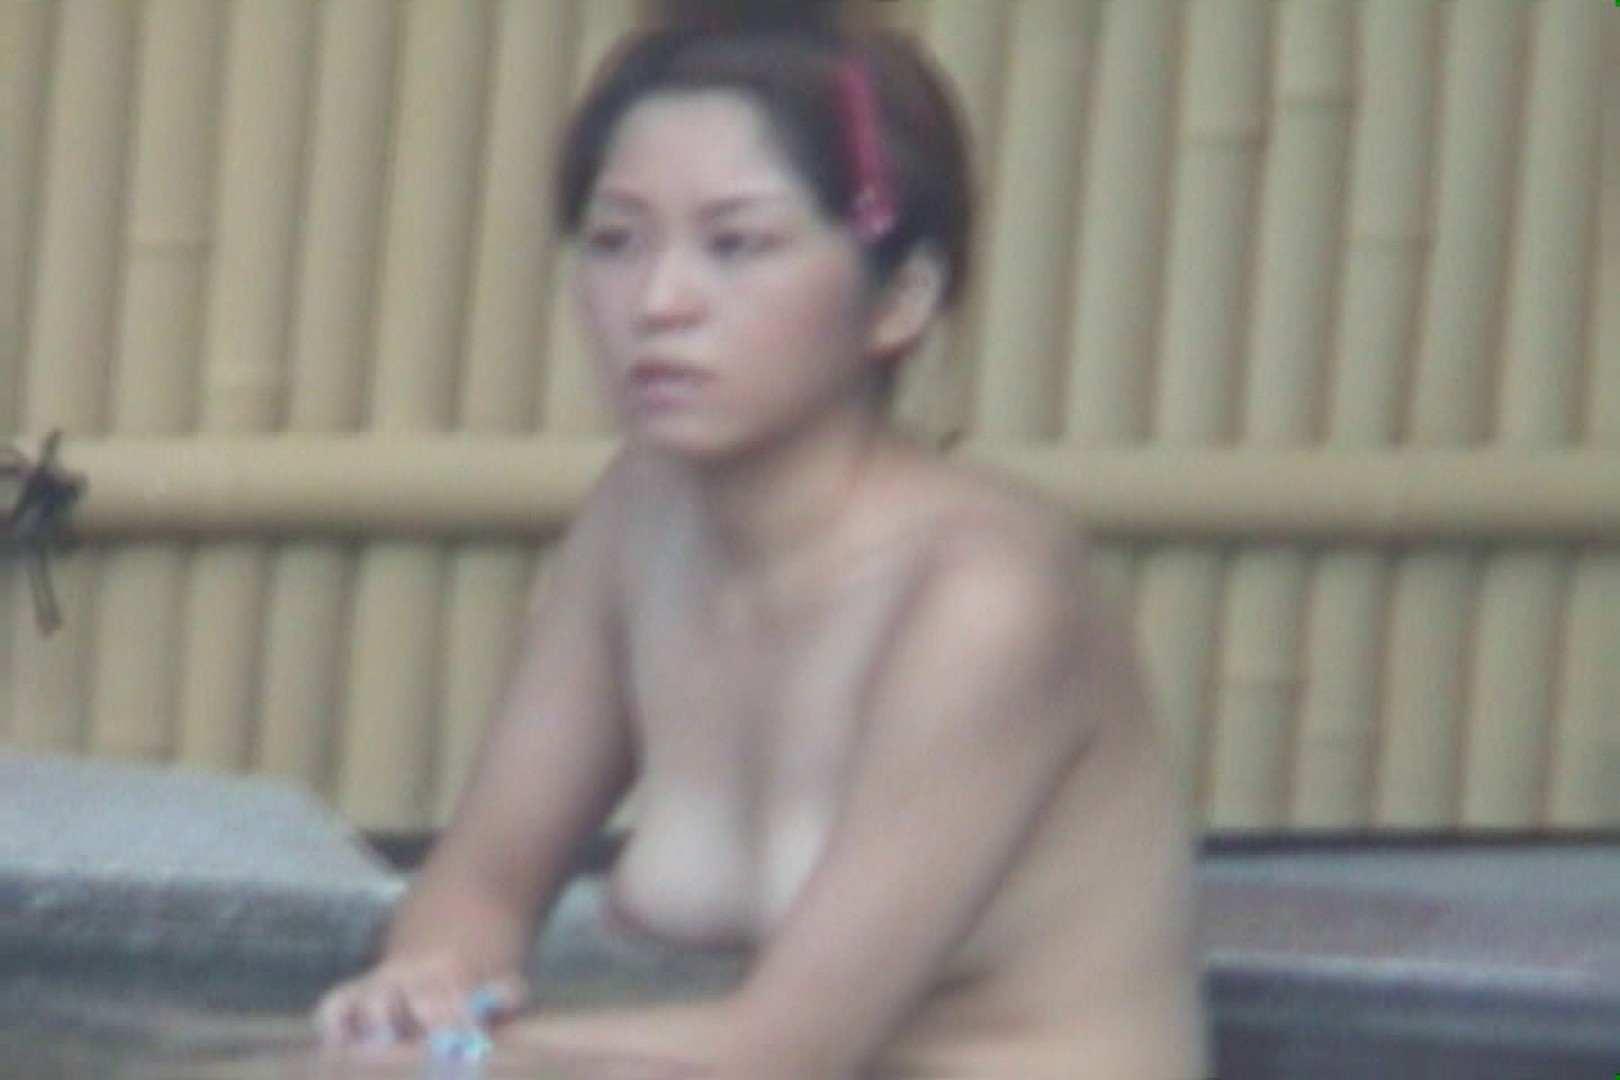 Aquaな露天風呂Vol.574 盗撮シリーズ | 露天風呂編  87PIX 63